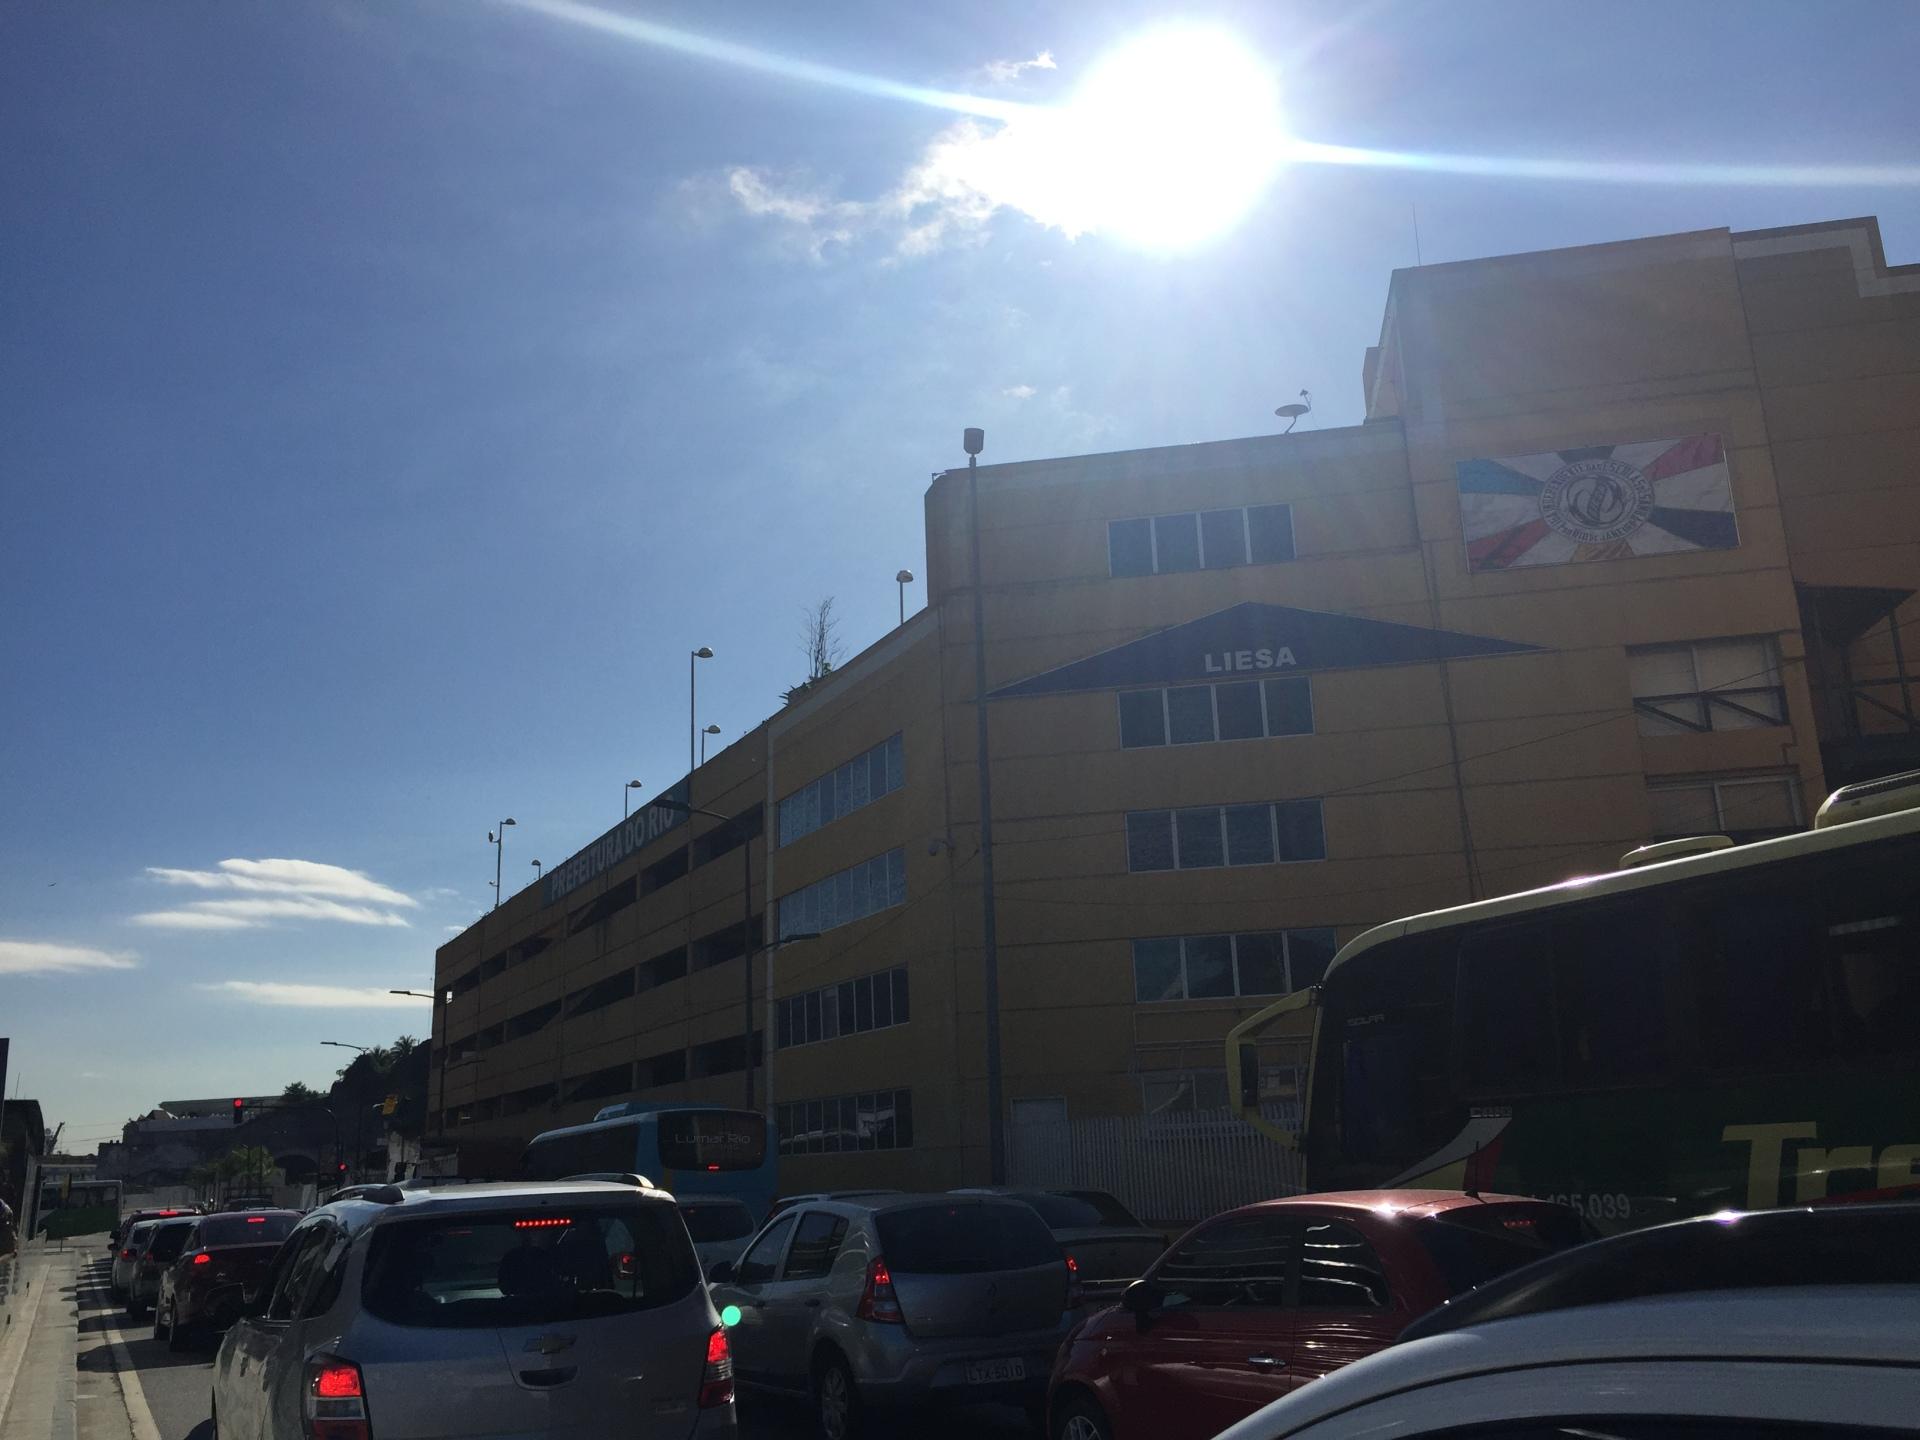 Estacionamento Cidade do Samba